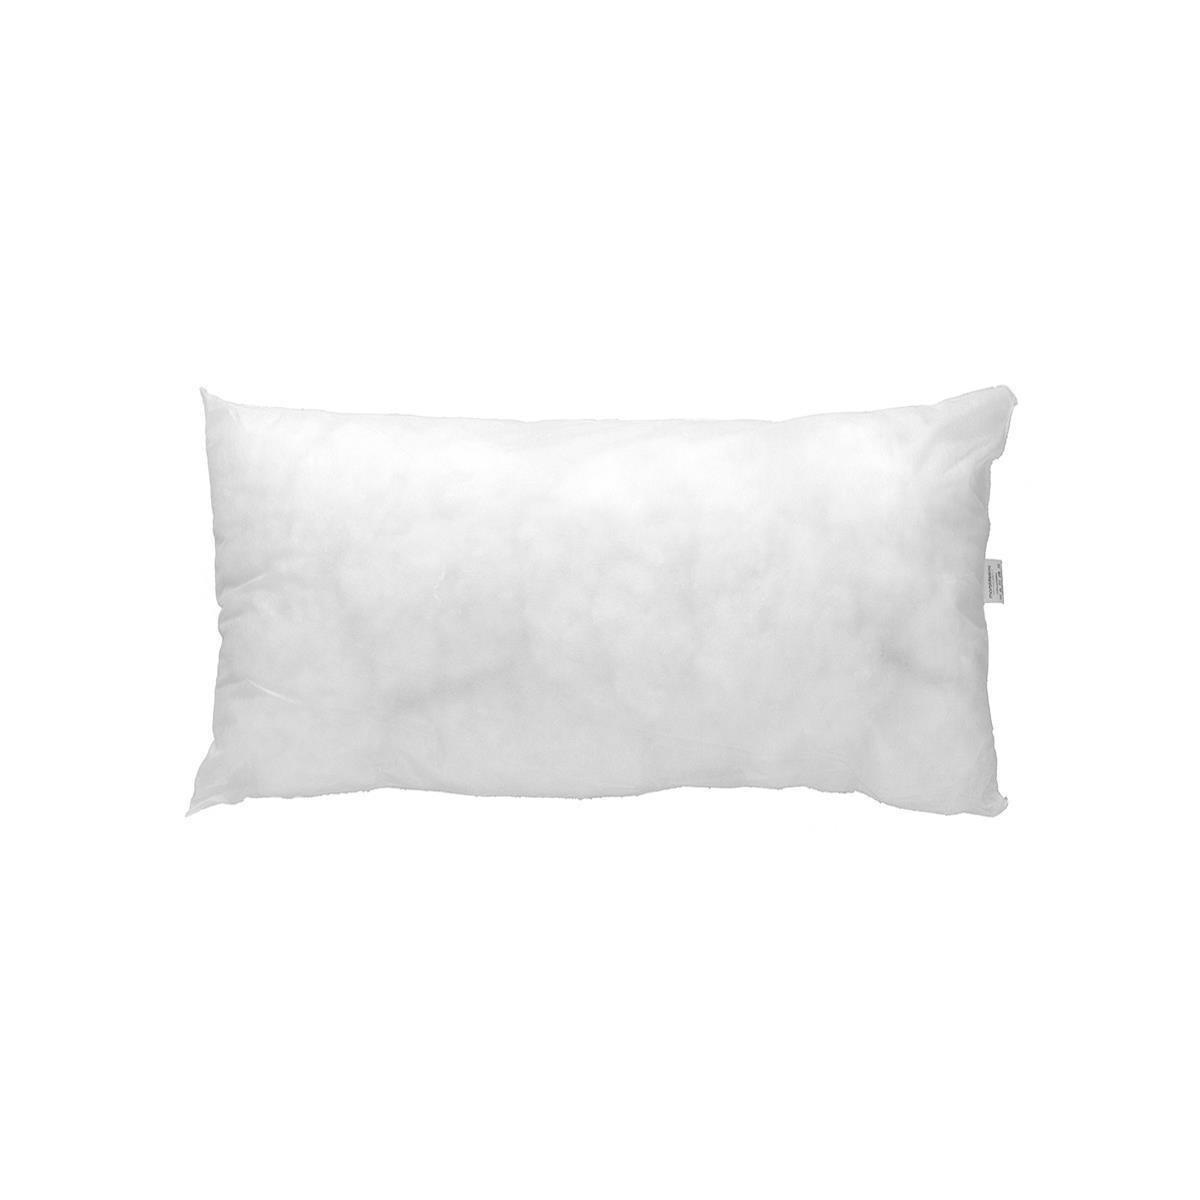 Morbidissimi Imbottitura cuscino arredo Anima interna rettangolare P555 35x65 cm